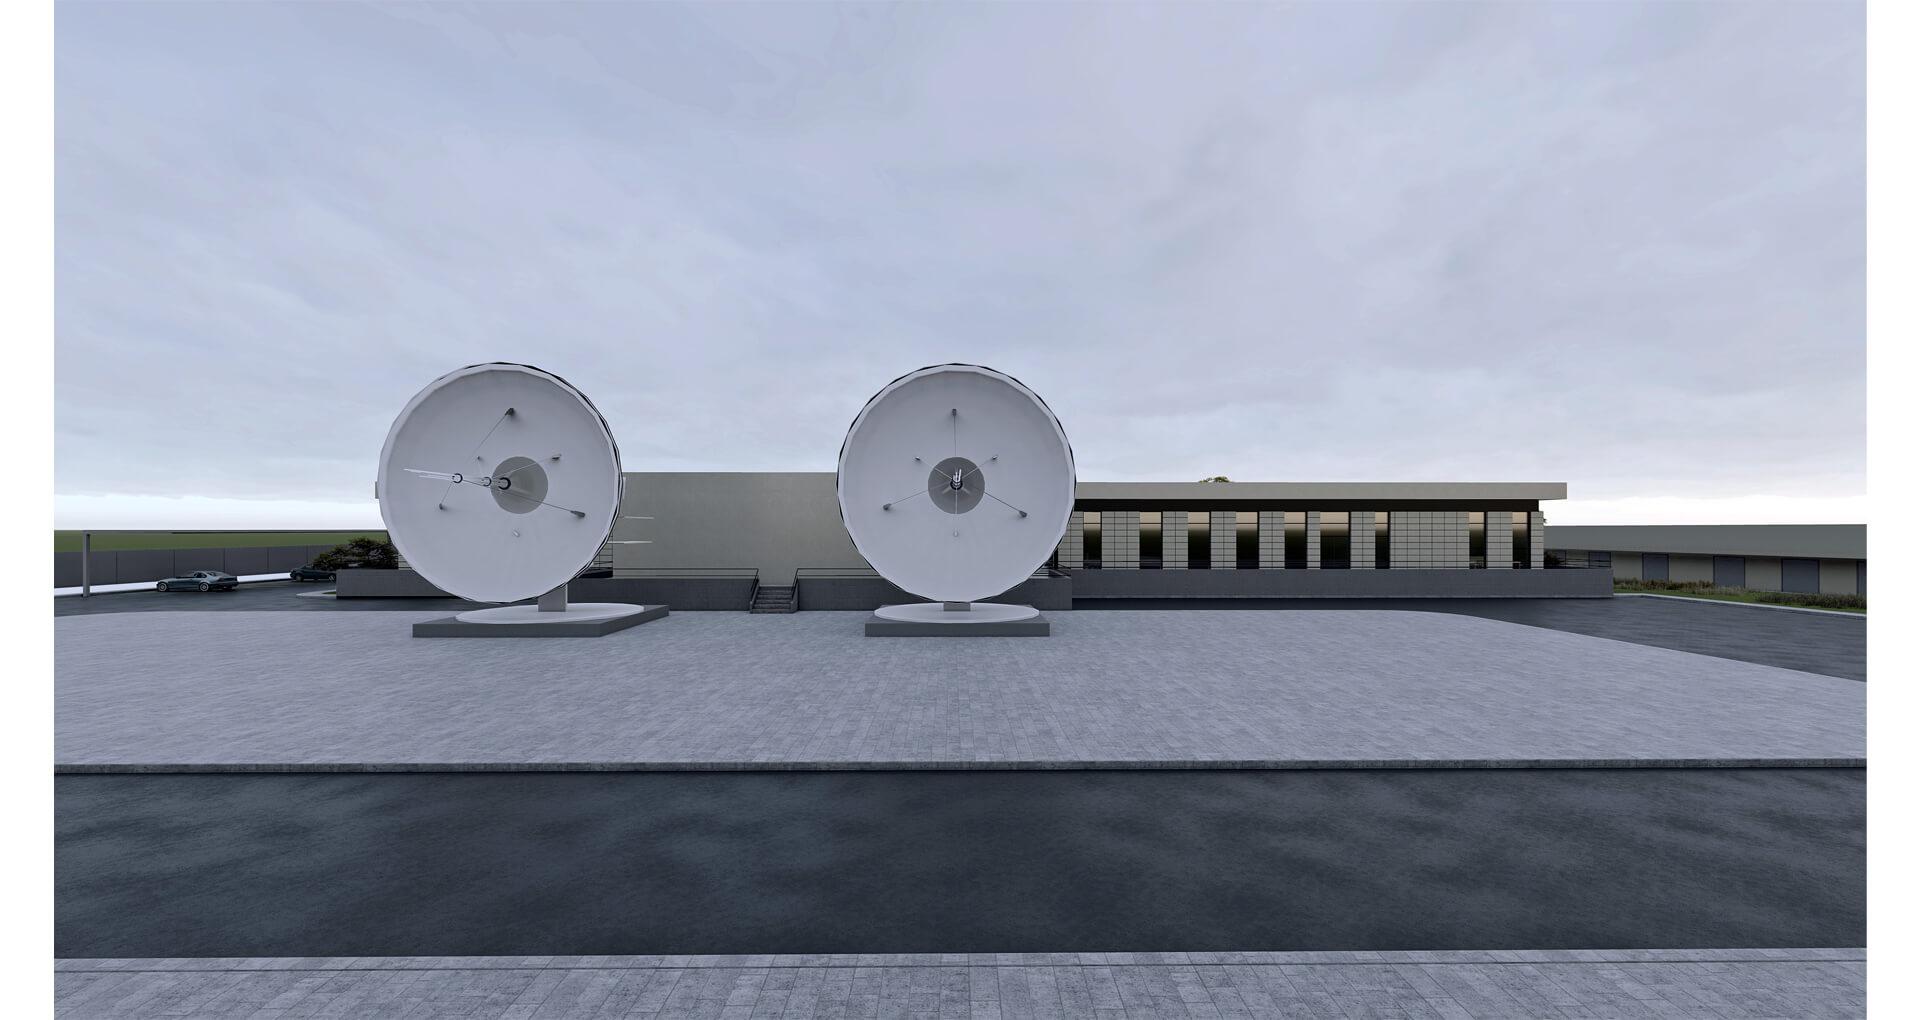 Ground Mission Segment Project